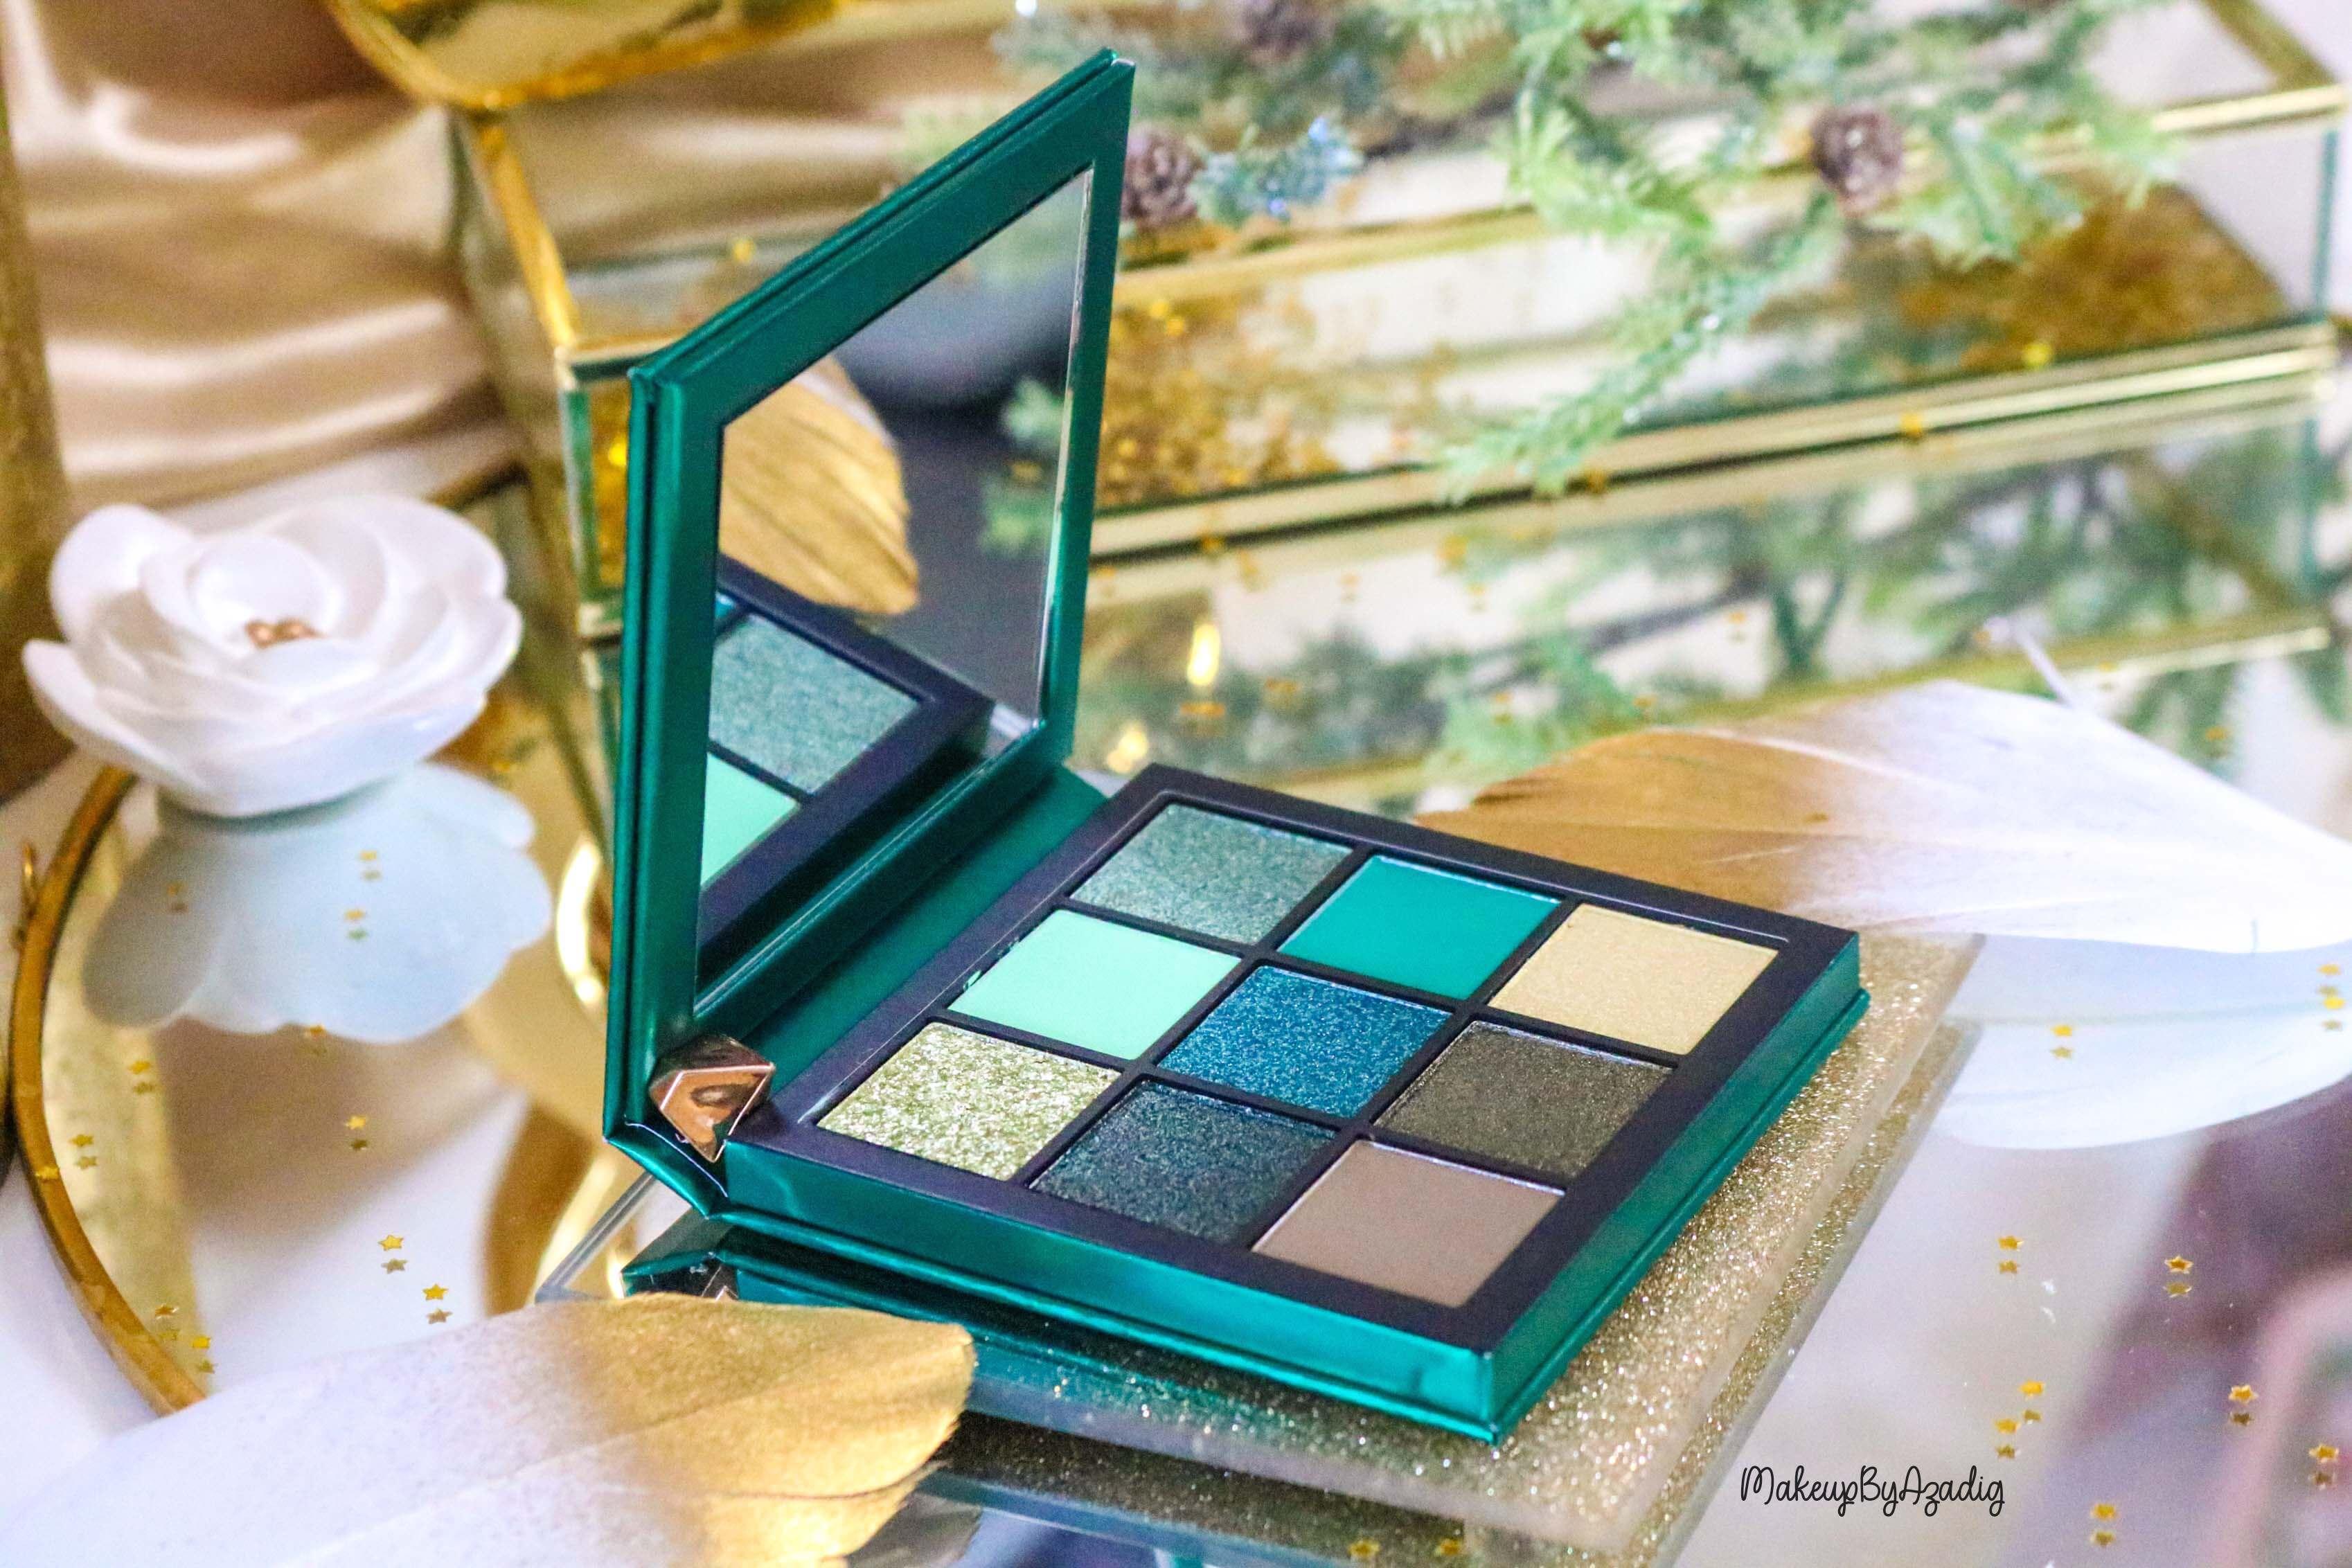 revue-review-palette-emerald-obsessions-huda-beauty-topaz-sapphire-avis-prix-swatch-makeupbyazadig-meilleure-verte